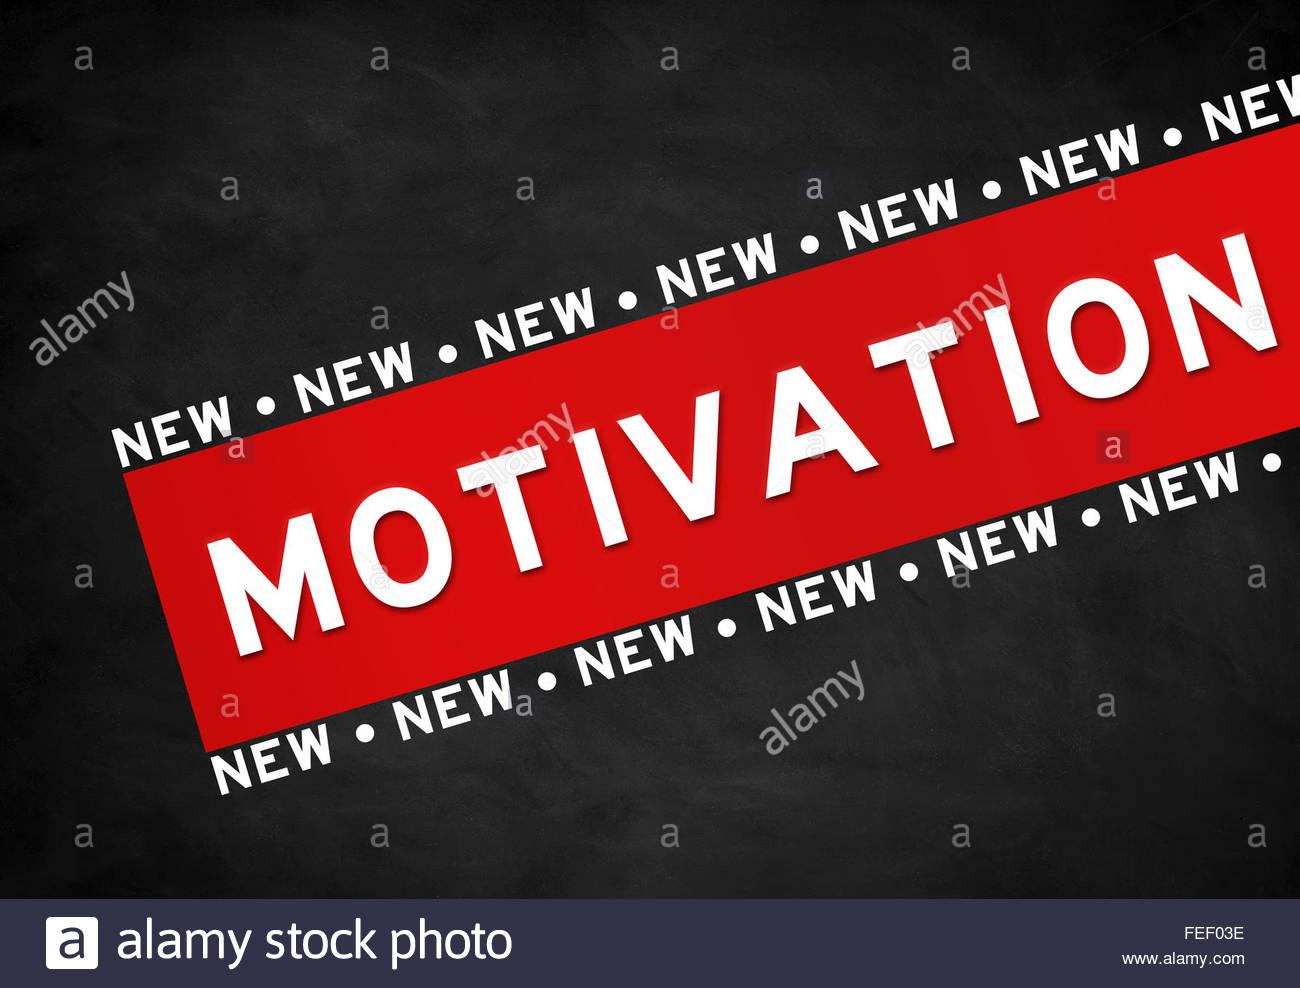 Motivation - chalkboard illustration - Stock Image